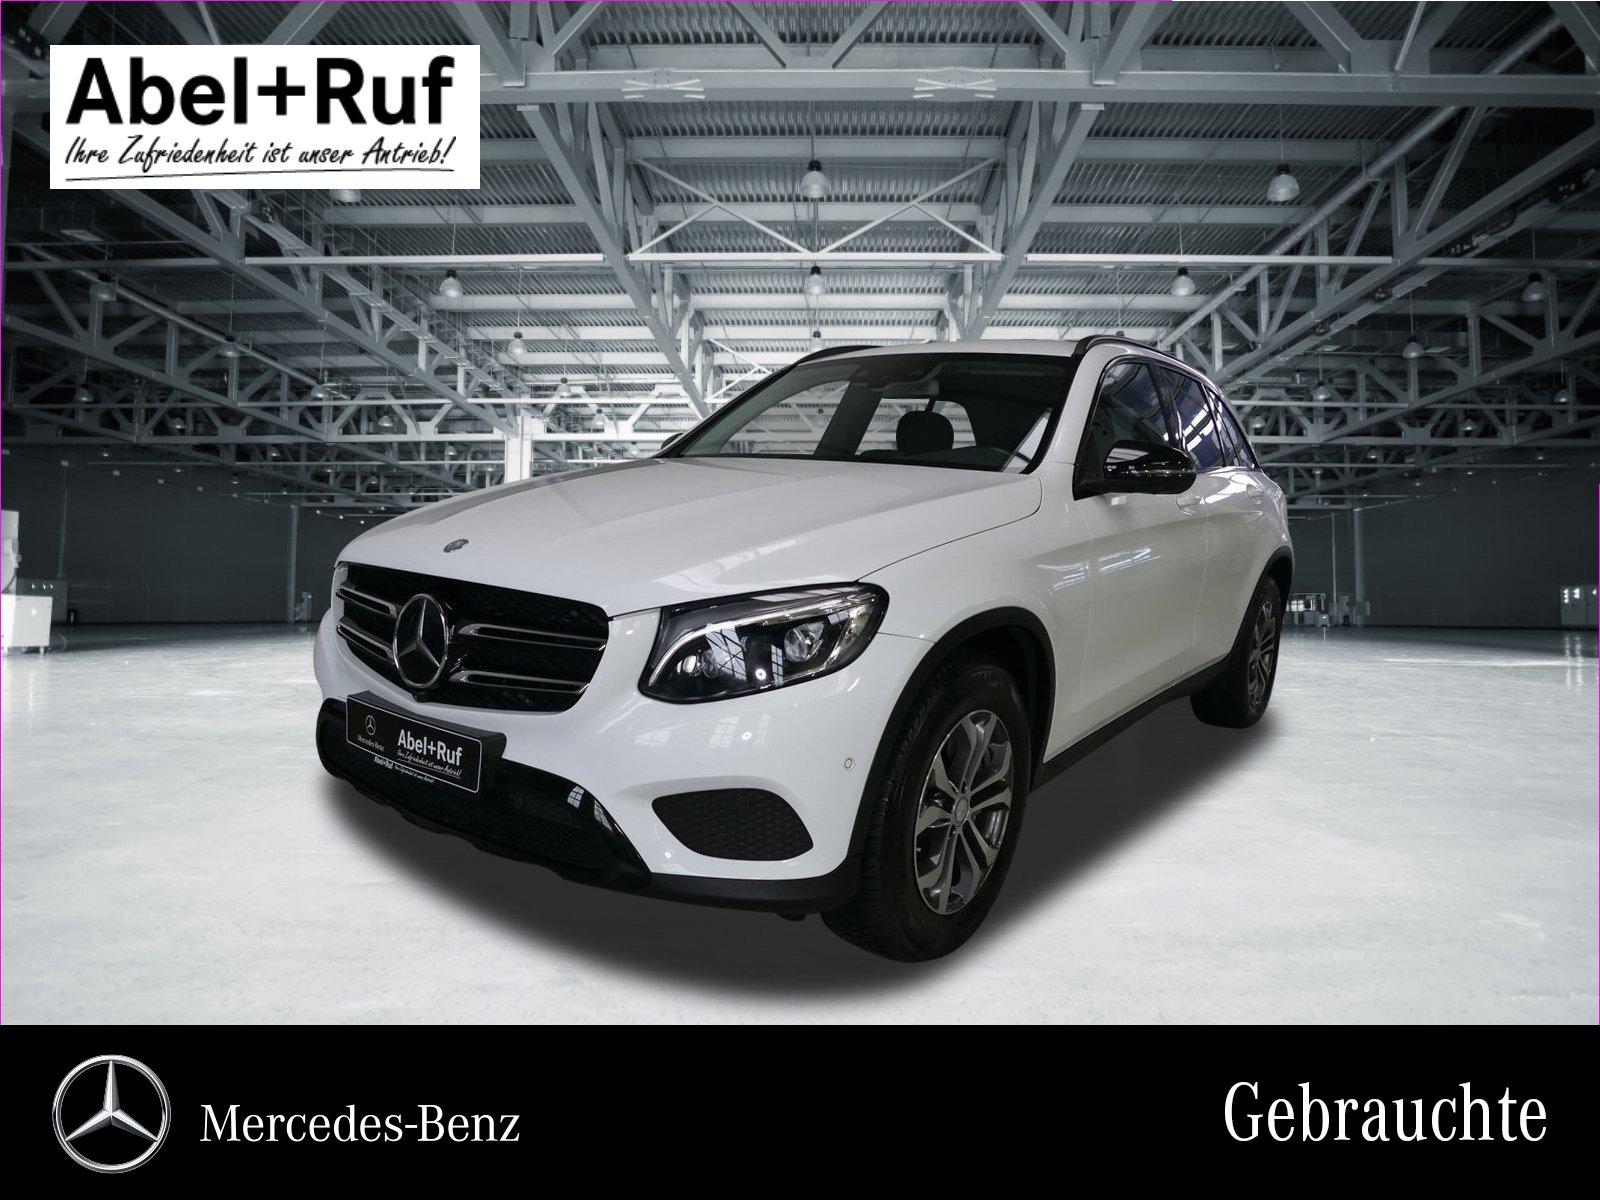 Mercedes-Benz GLC 220 4M Distronic+360°-Kamera+Navi+Night-Pk, Jahr 2015, Diesel